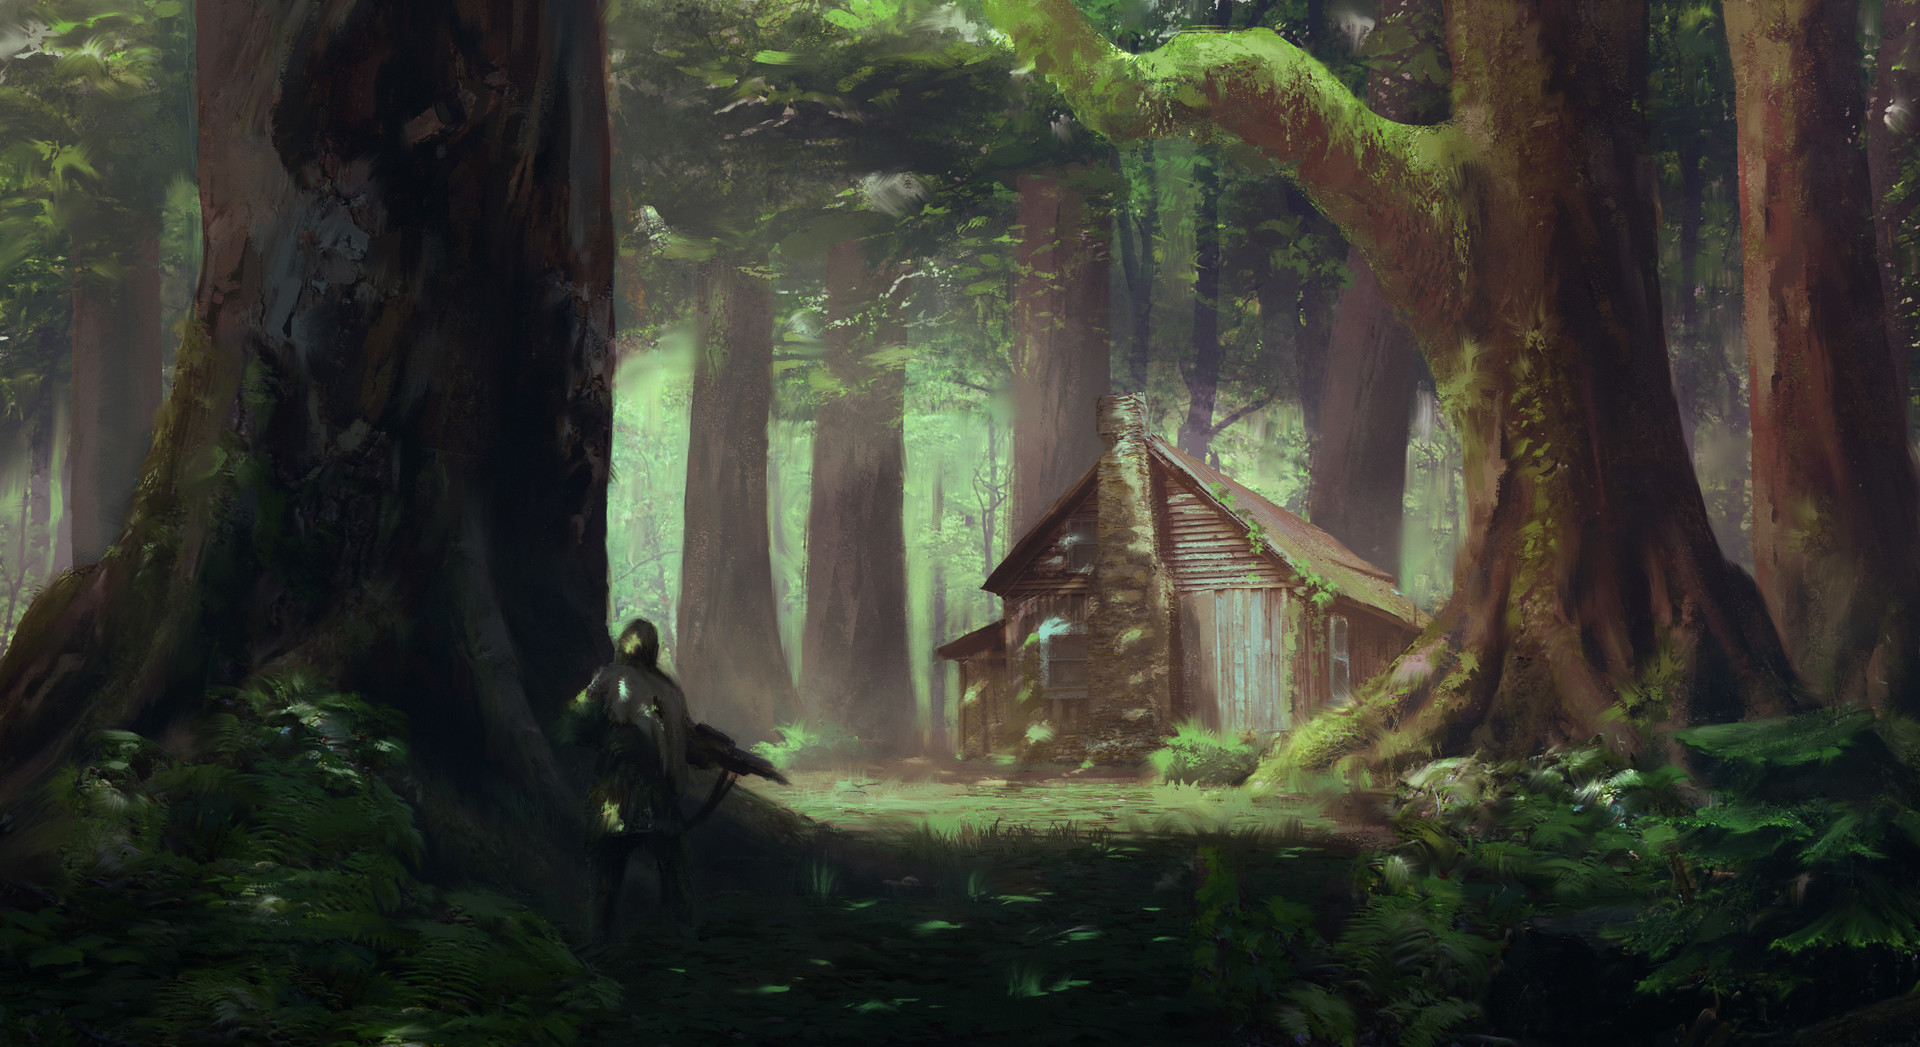 Manuel robles trees7